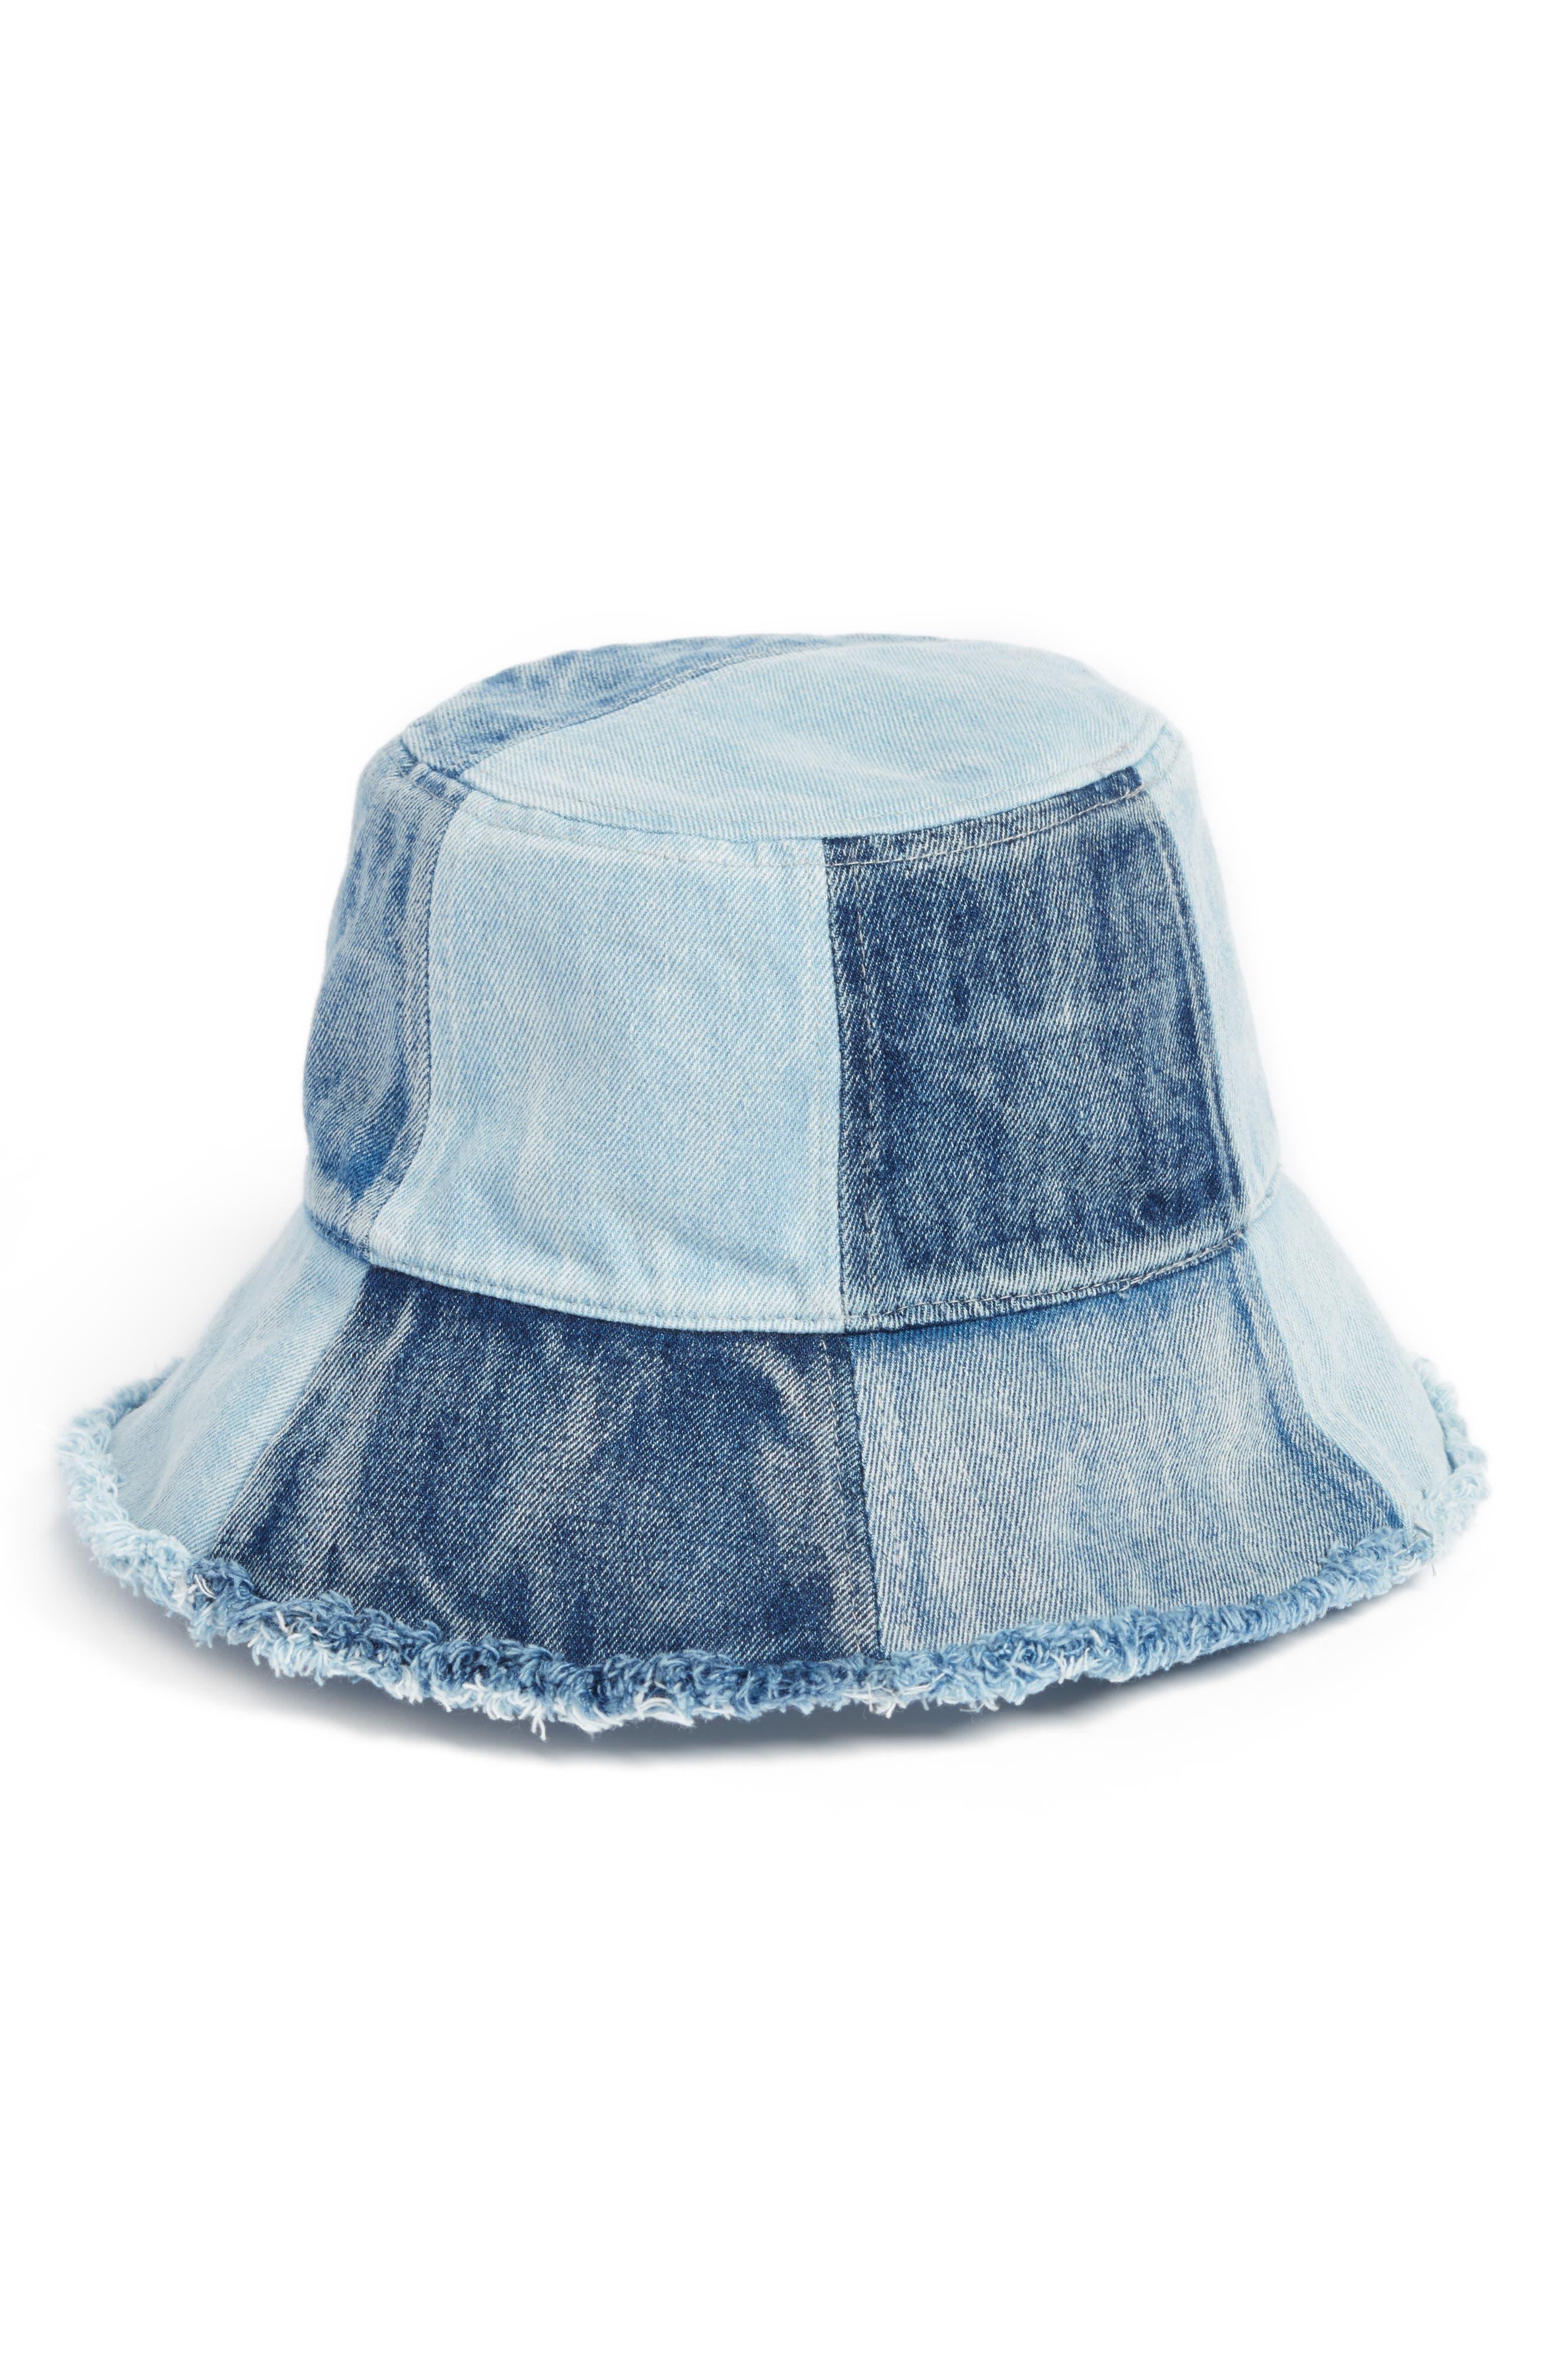 Patched Denim Bucket Hat,                         Main,                         color, 410